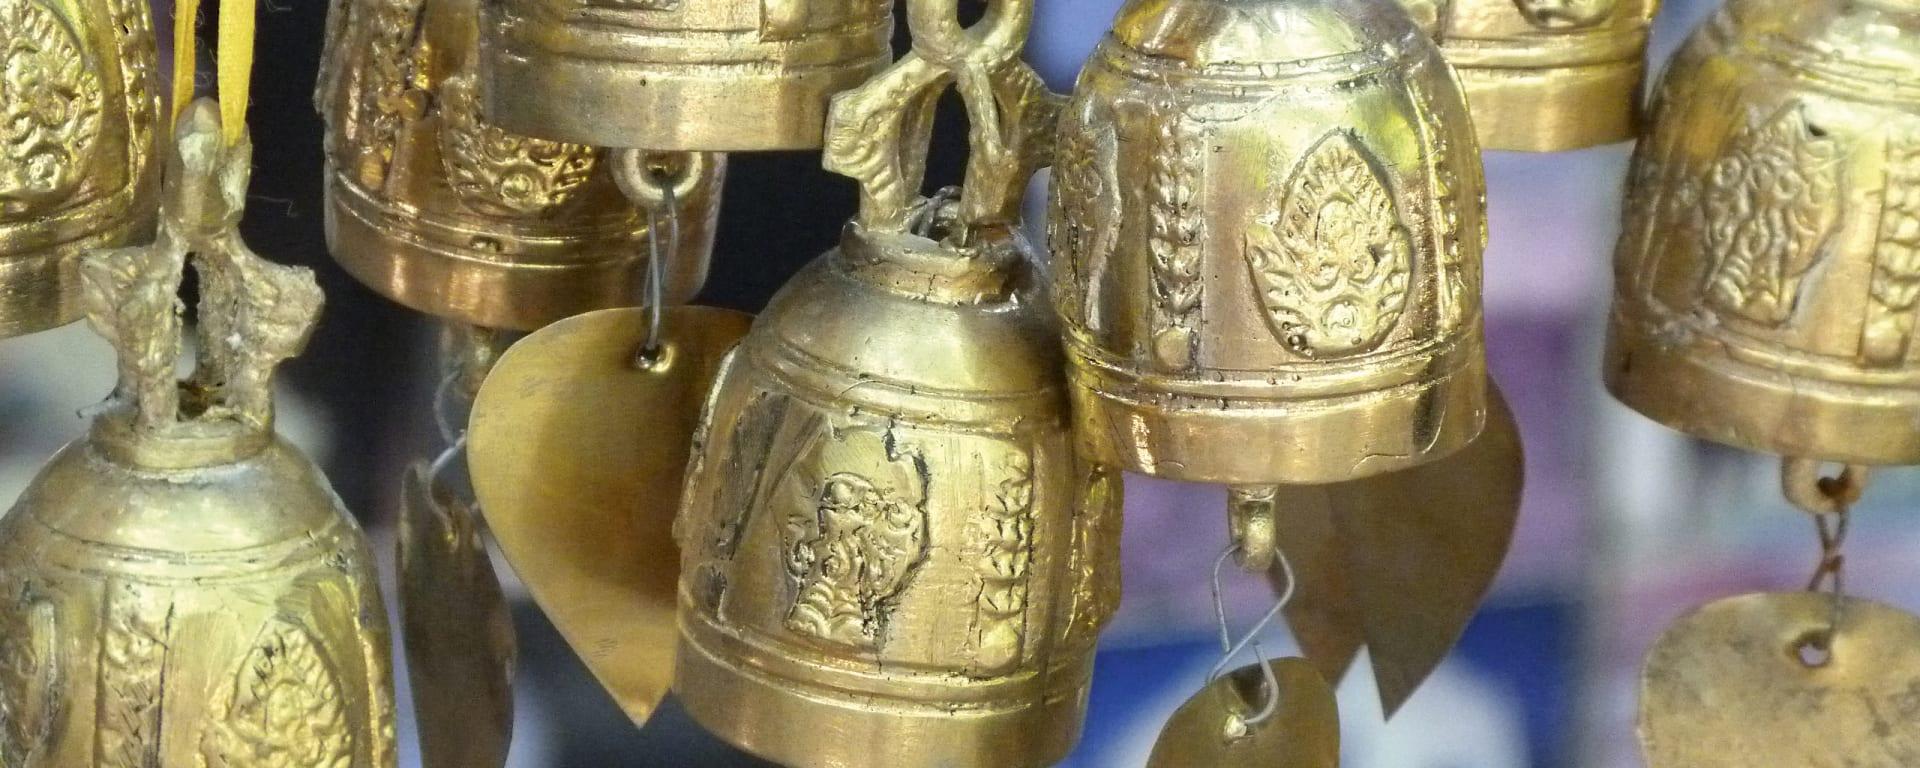 Ayutthaya & Mae Klong ab Bangkok: 1th-ayutthaya-003